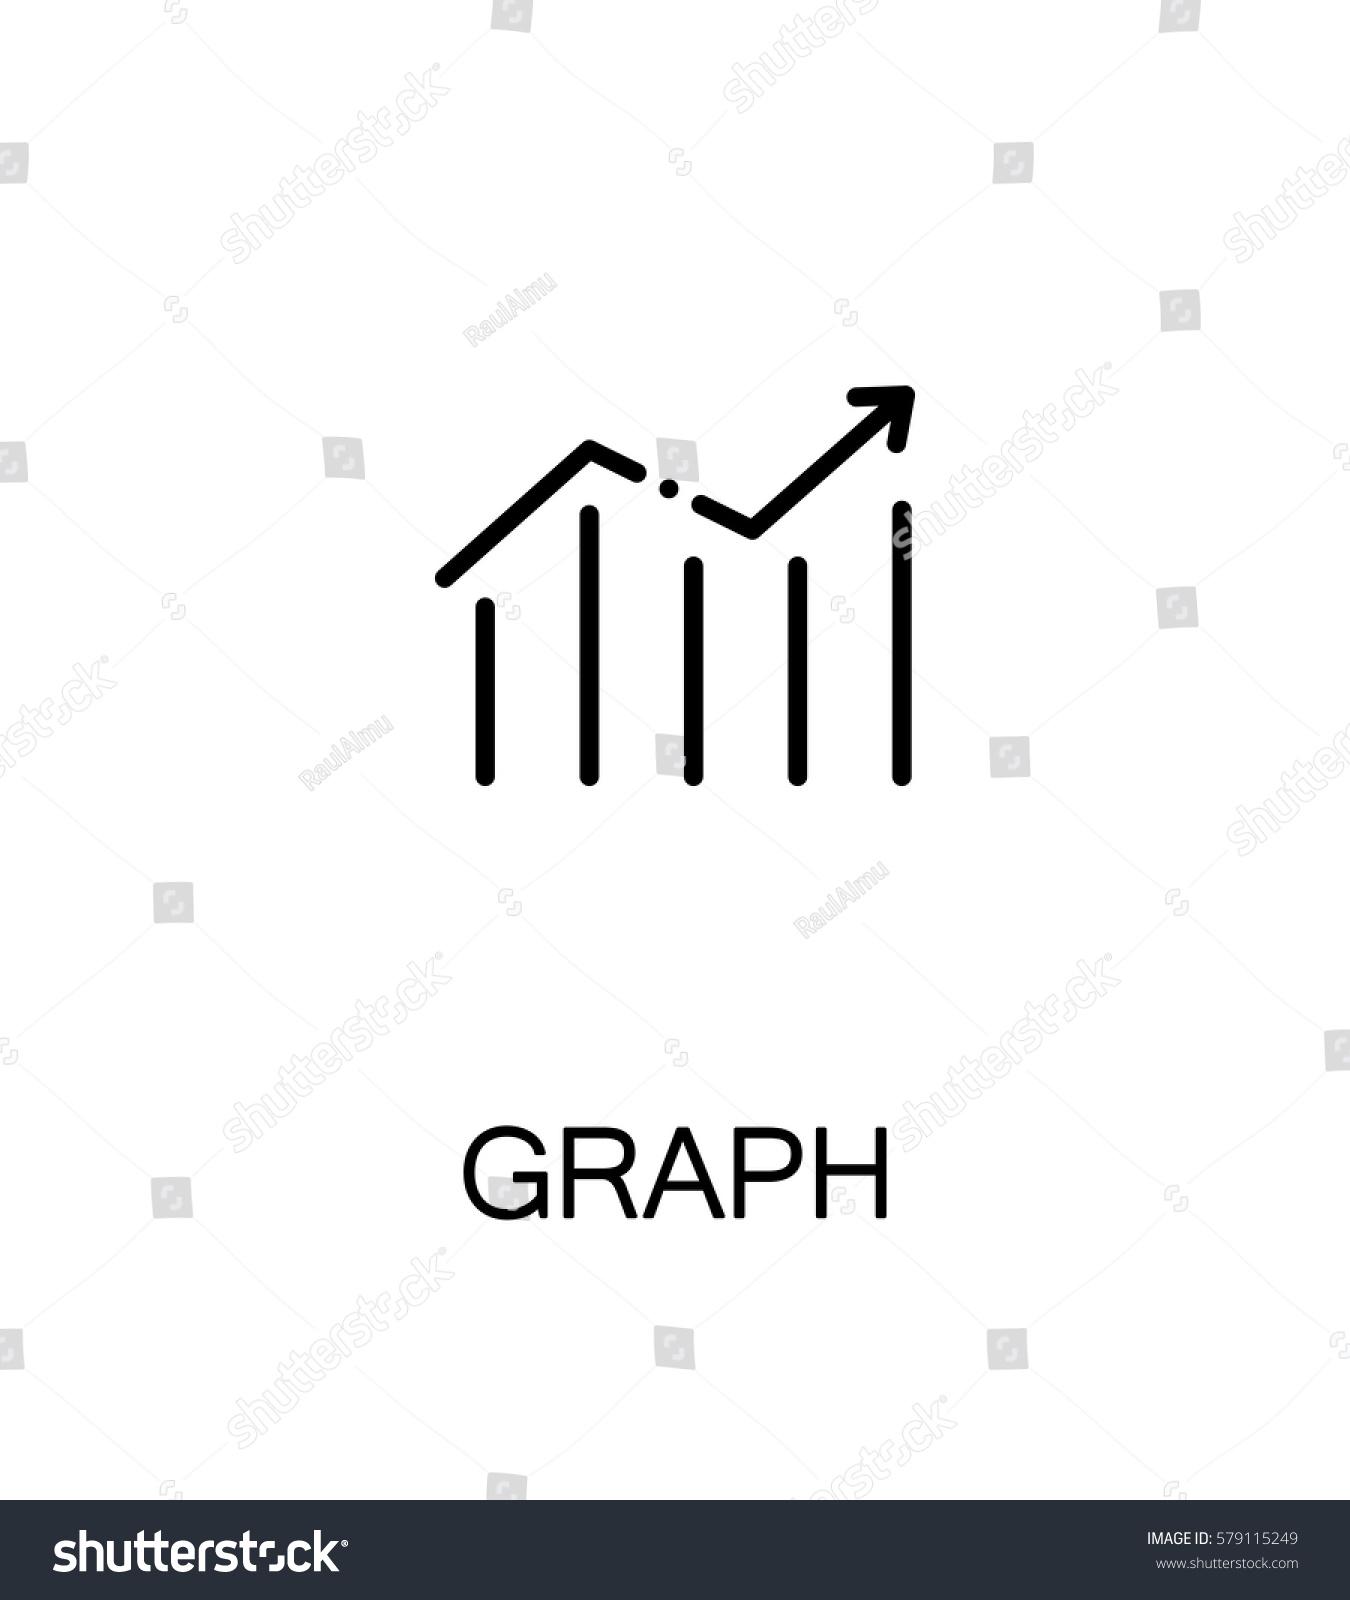 Graph icon single high quality outline stock vector 579115249 single high quality outline symbol for web design or mobile app thin buycottarizona